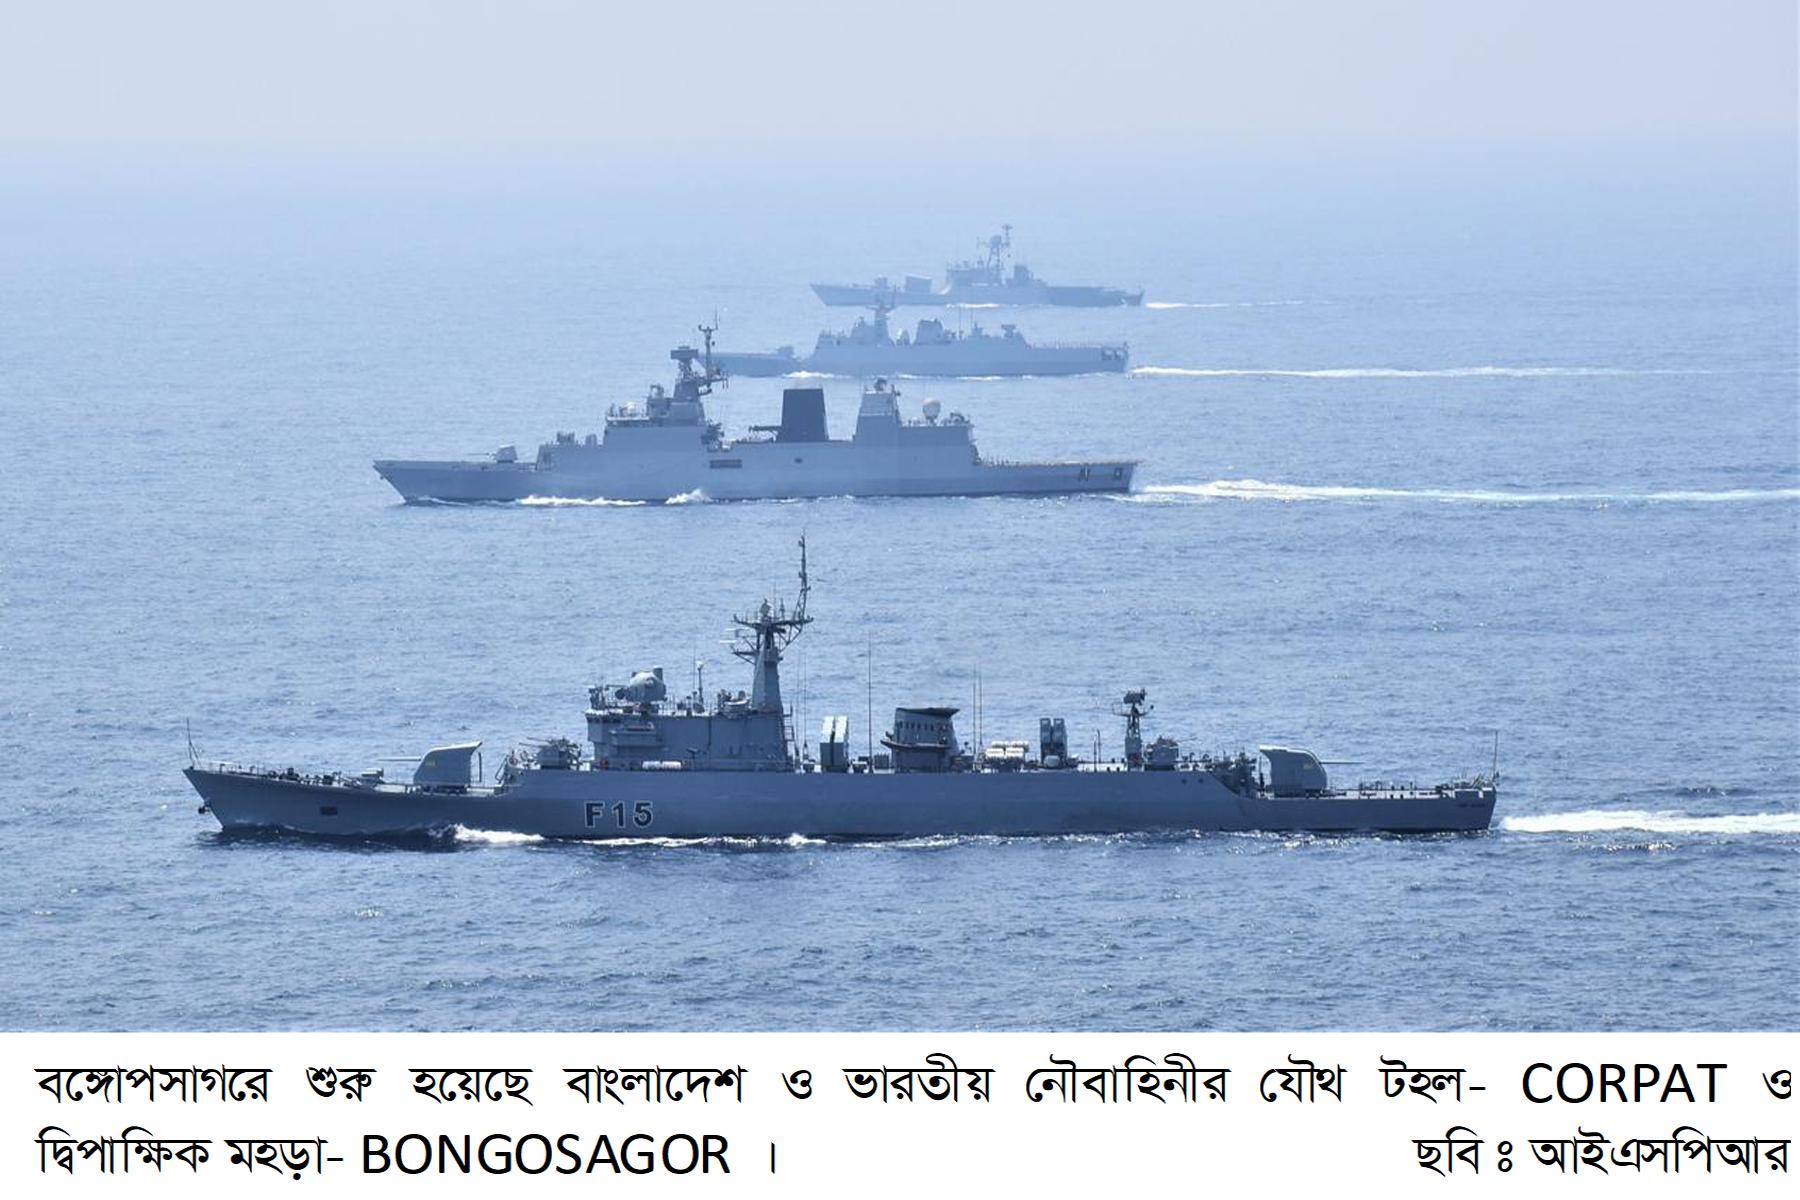 ISPR Navy - 03-10-2020 (3)